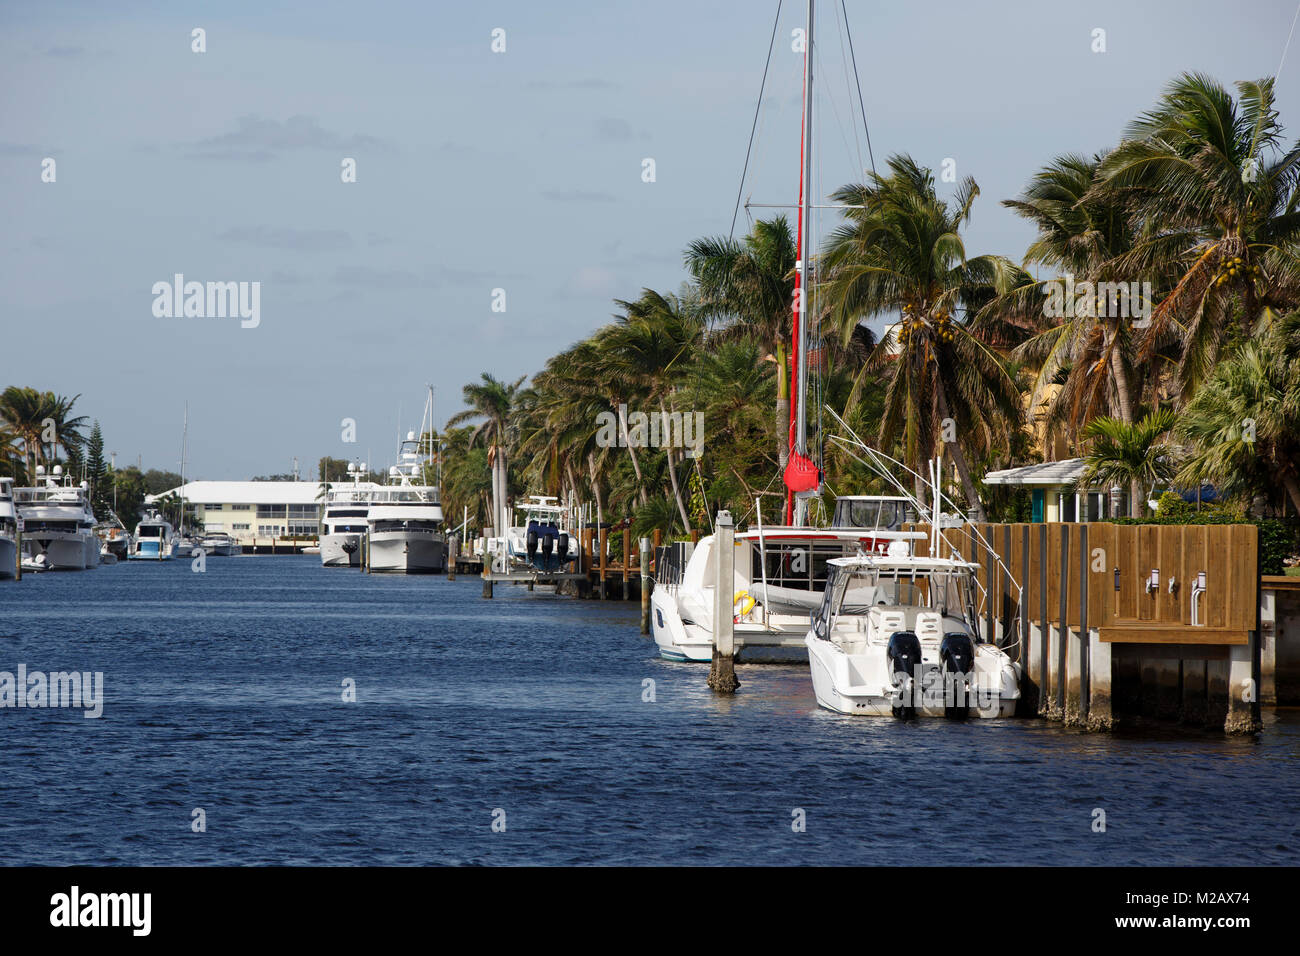 Canal, Hillsboro Beach, Florida - Stock Image